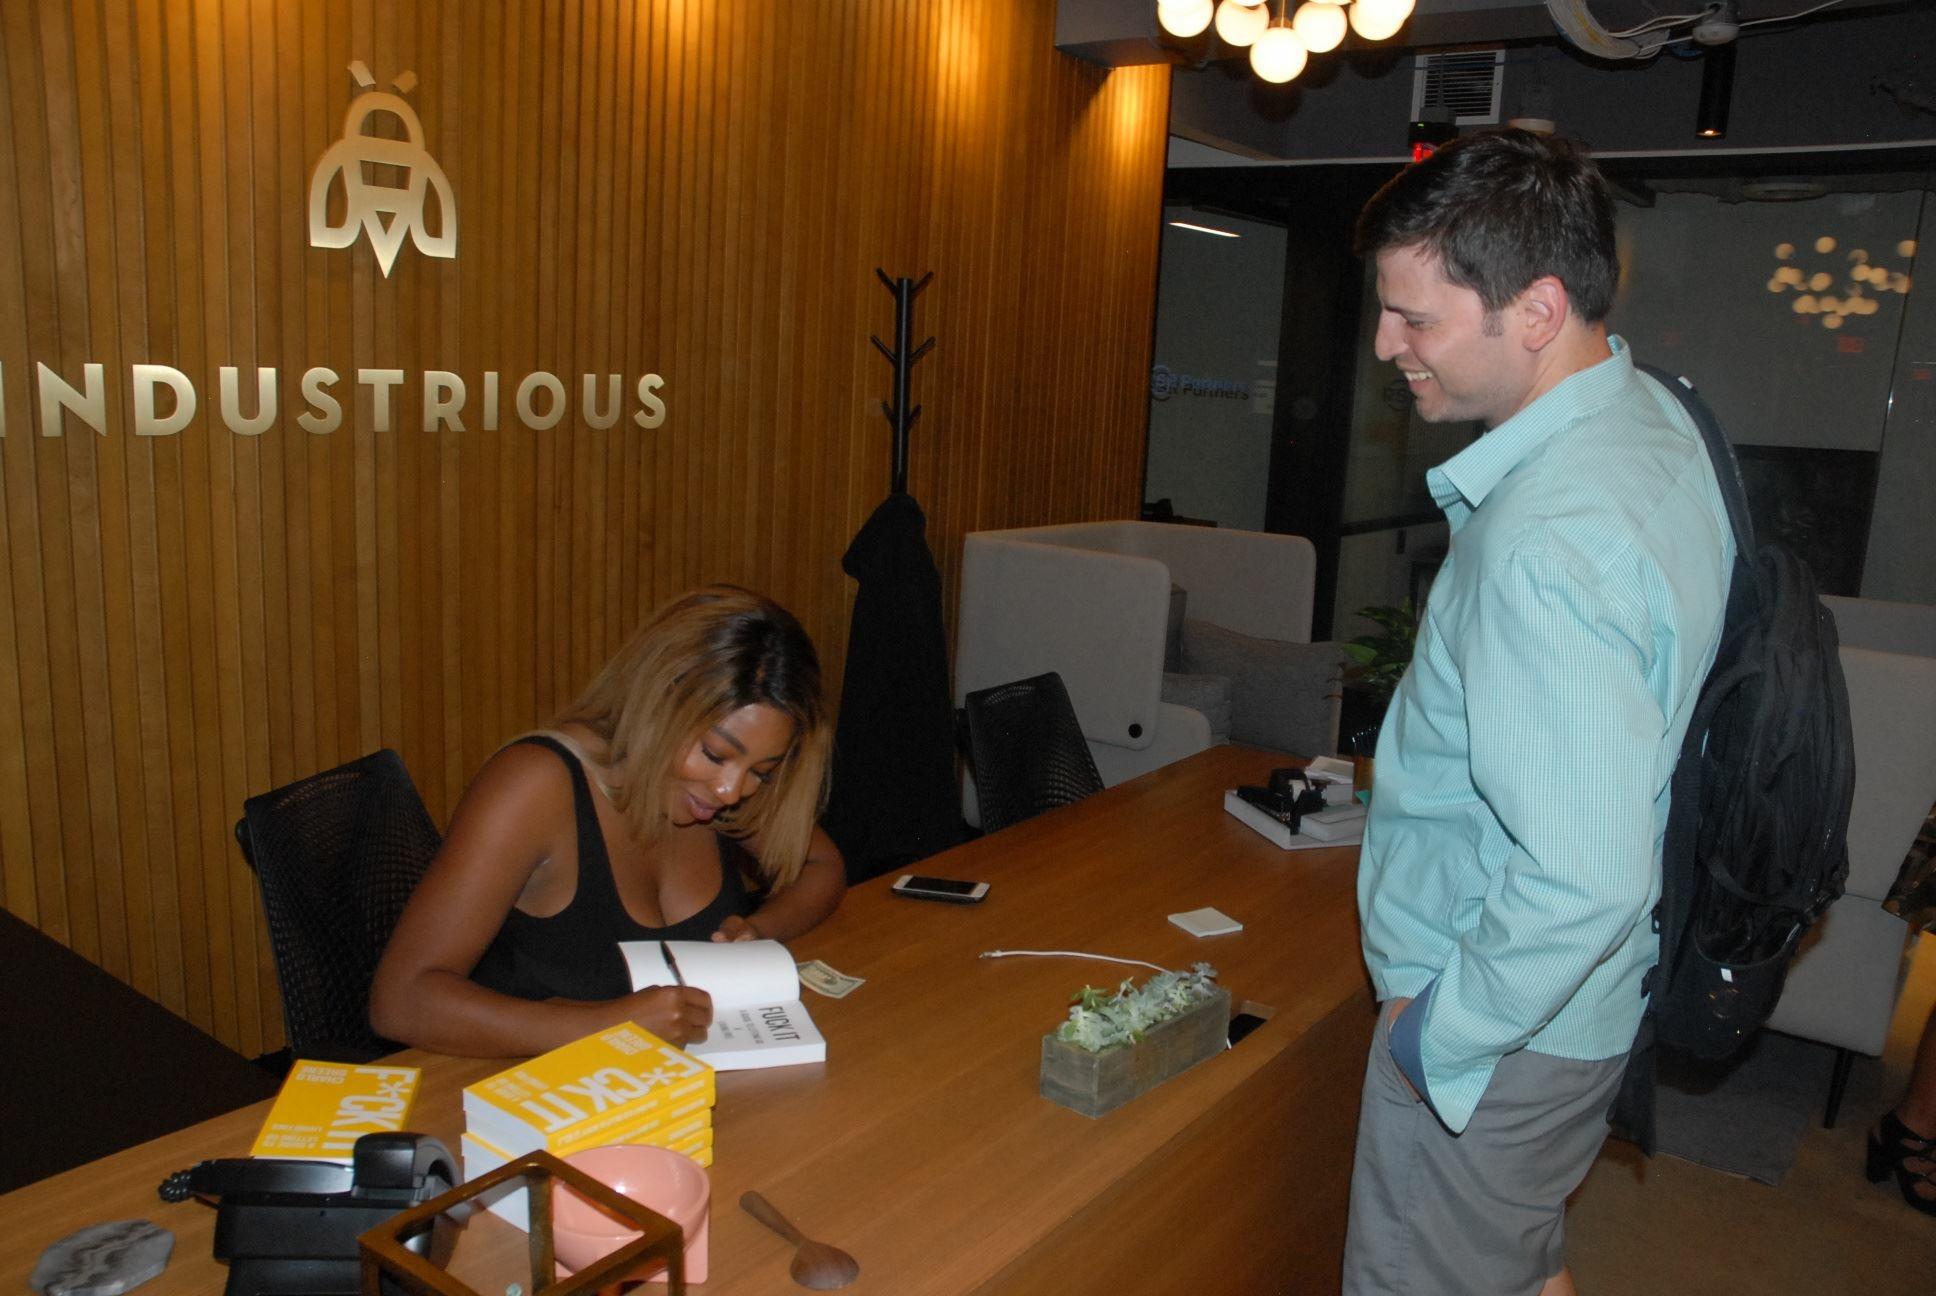 Charlo Greene DC Book Signing2436 2.JPG